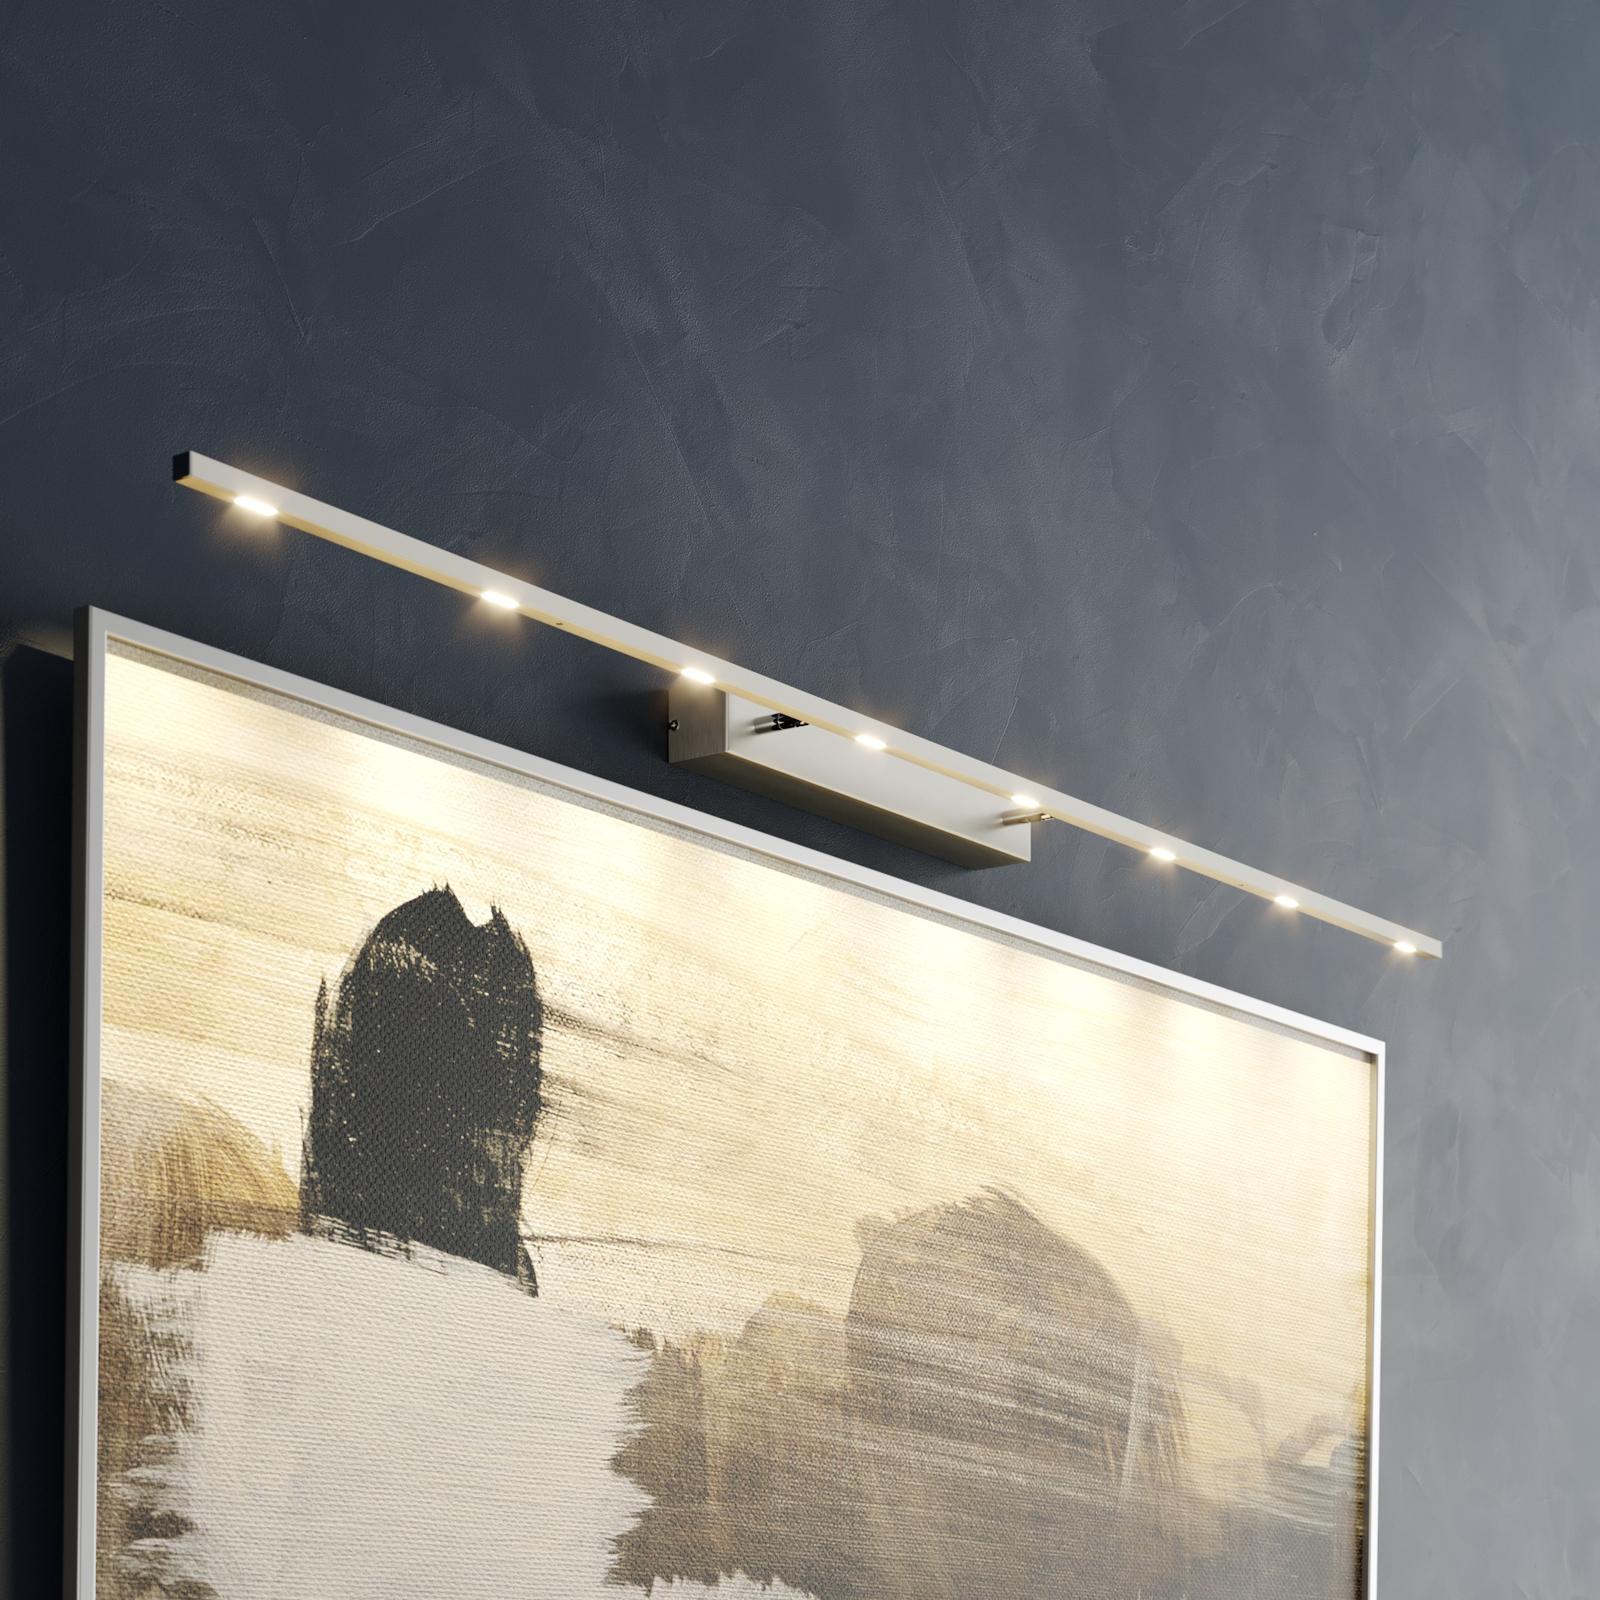 Flexible LED picture lamp Tolu, modern design_6722268_1